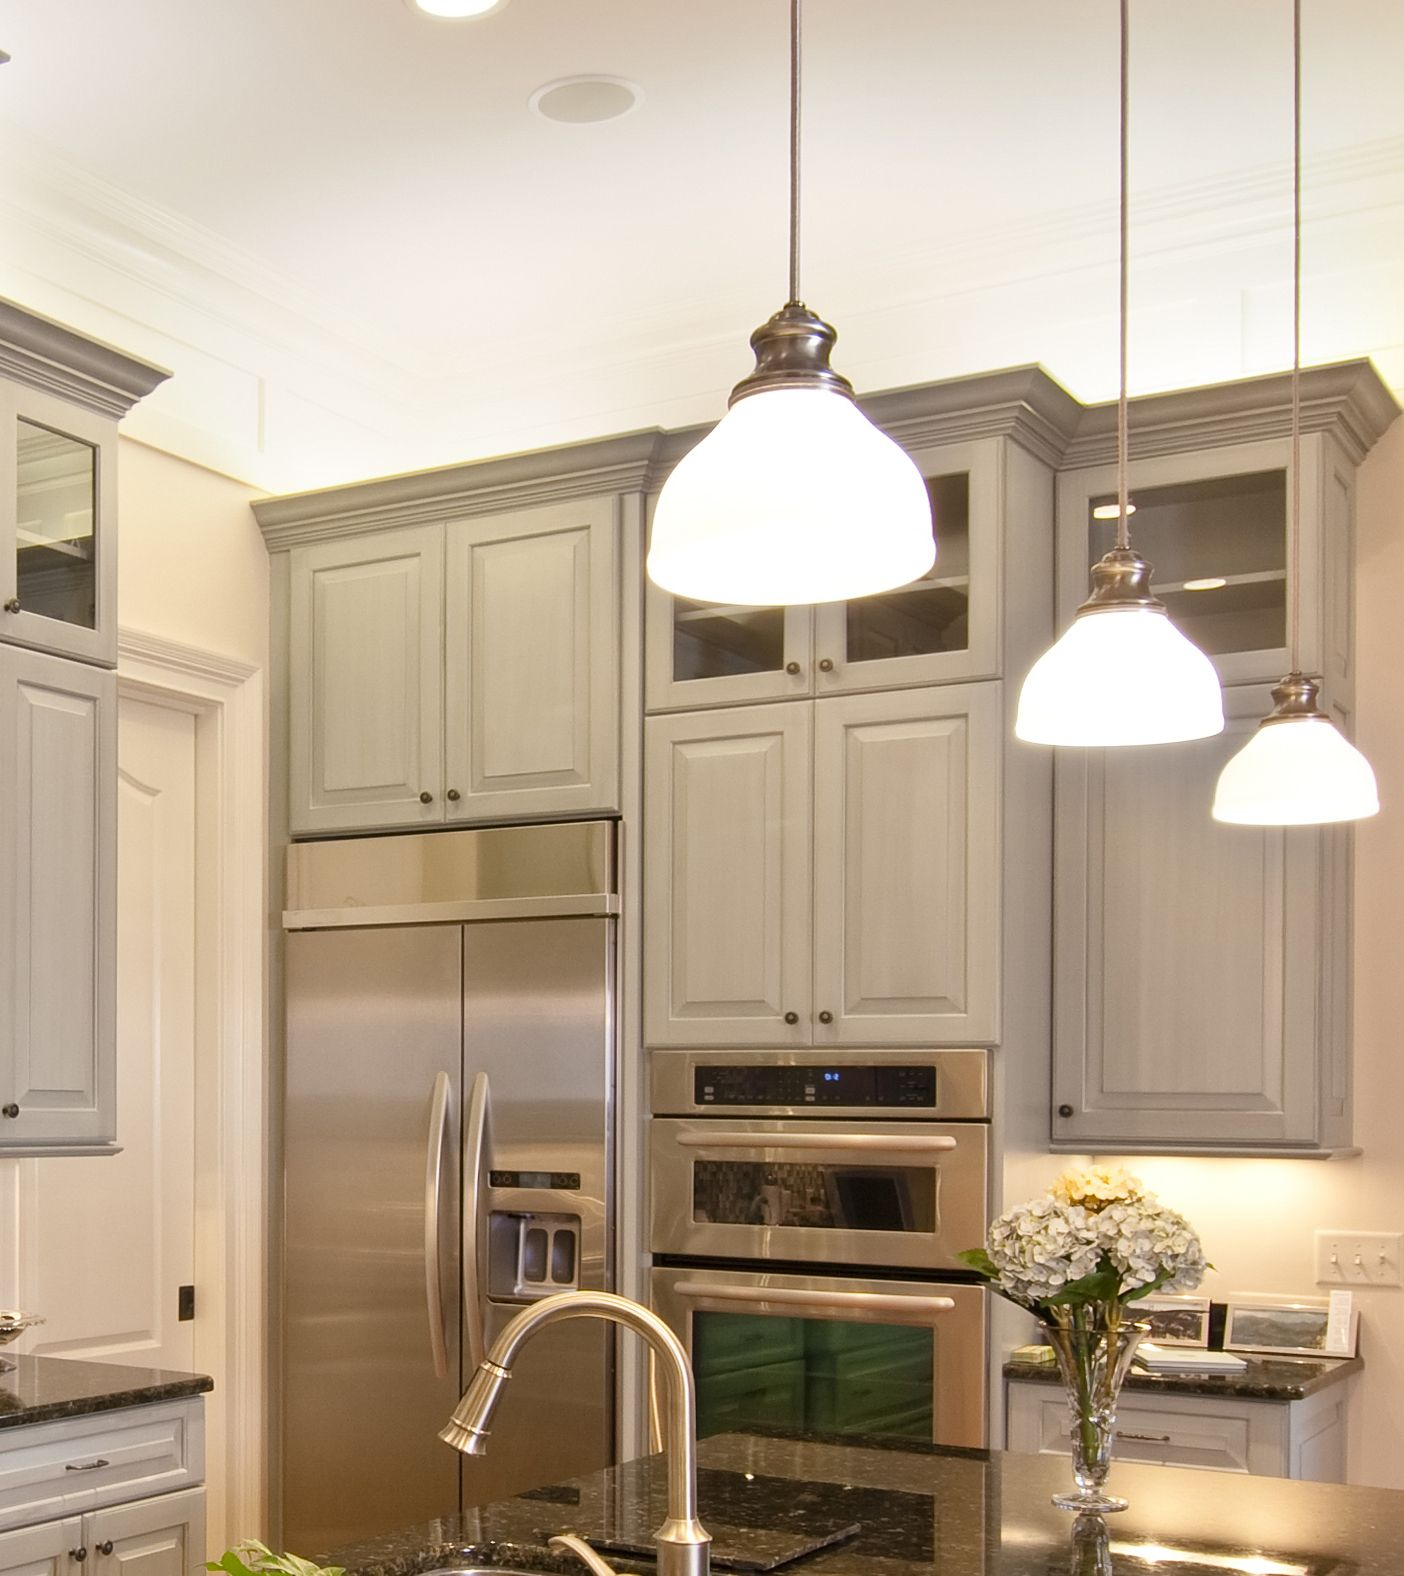 Prasada Kitchens And Fine Cabinetry: Grey Kitchen Cabinets - Design Ideas